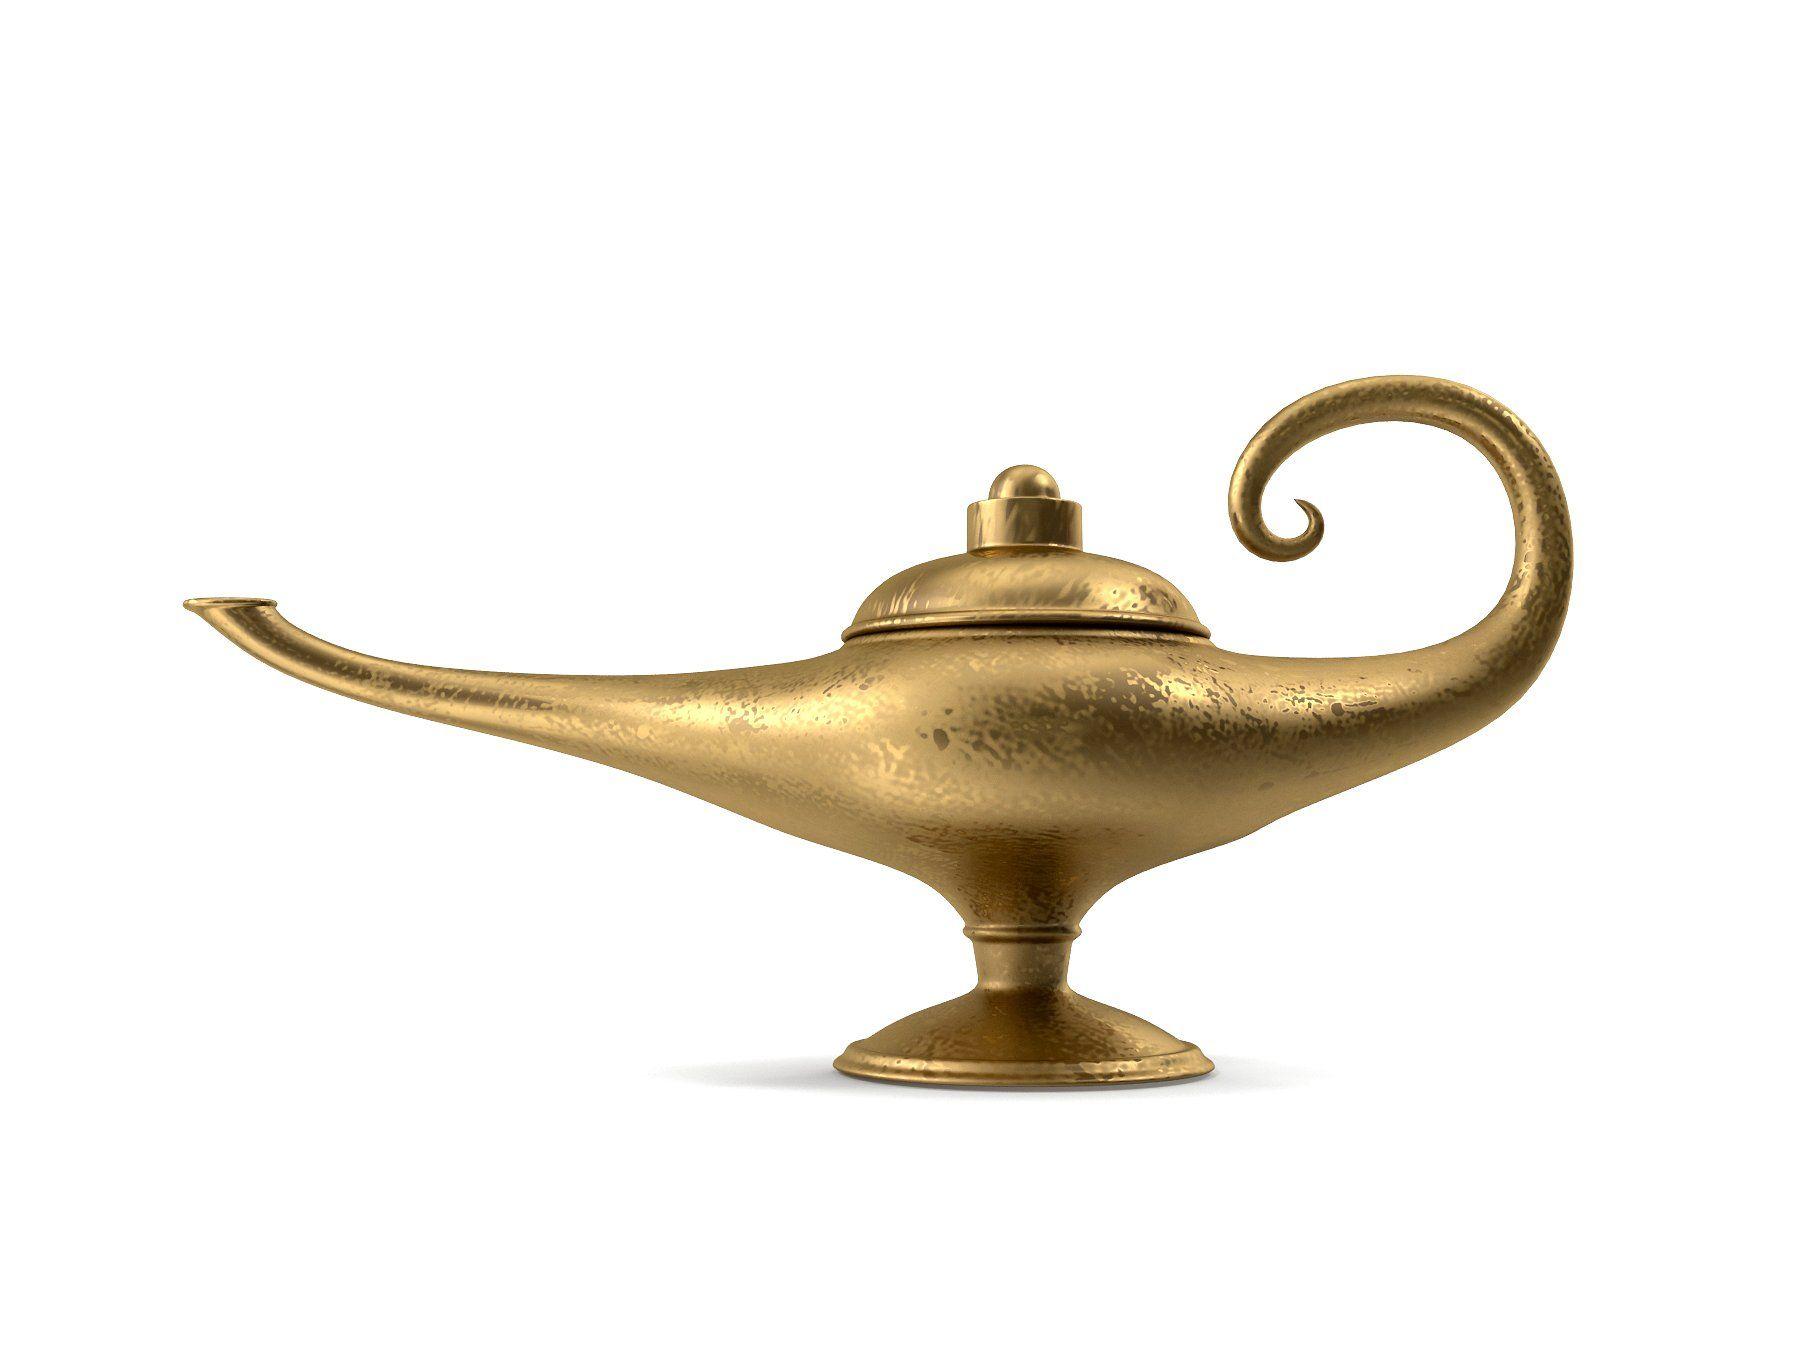 Aladin Lamp Aladdin Lamp Lamp Tattoo Aladin